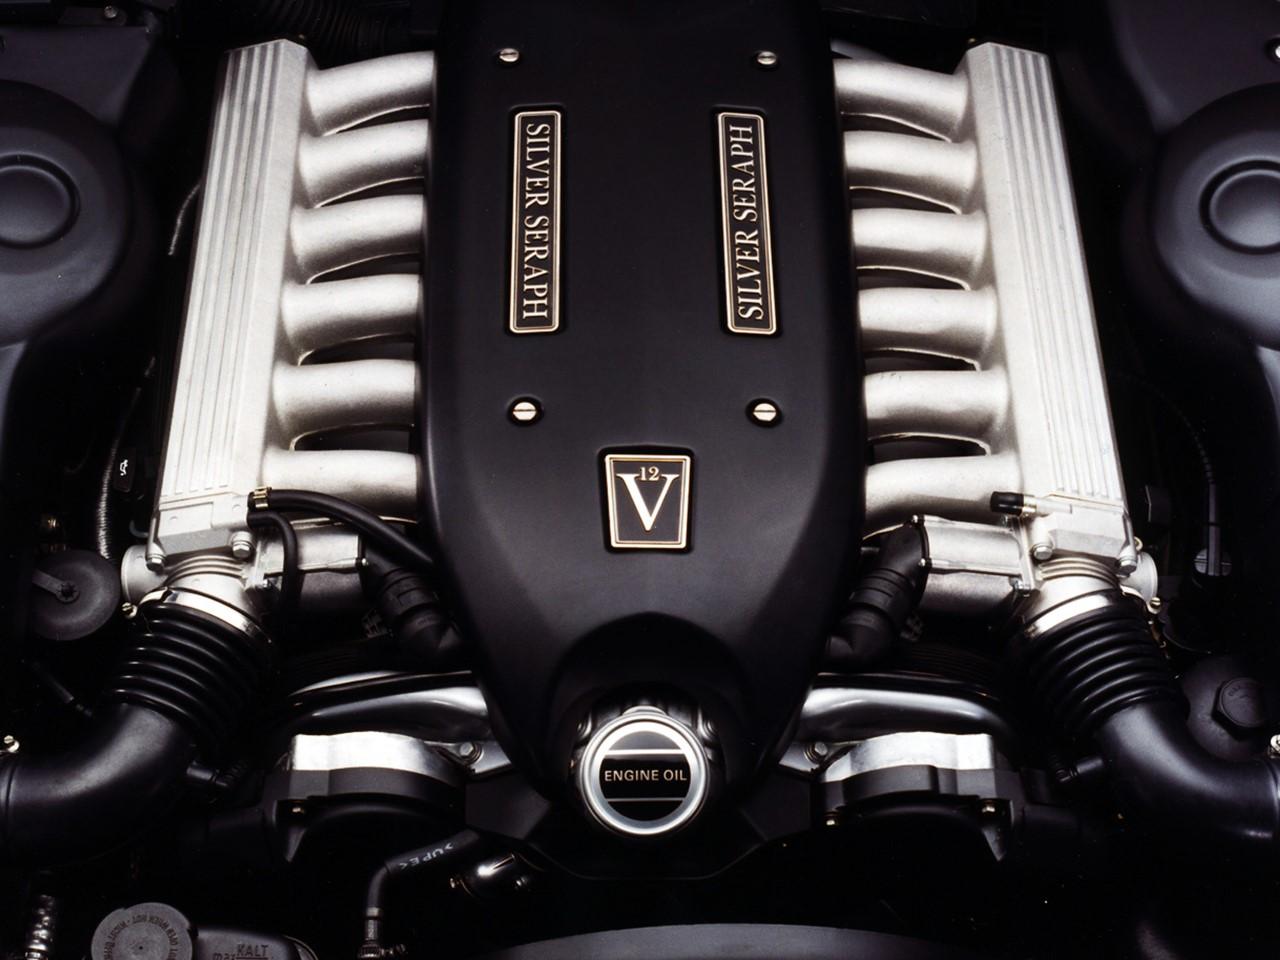 V12 7